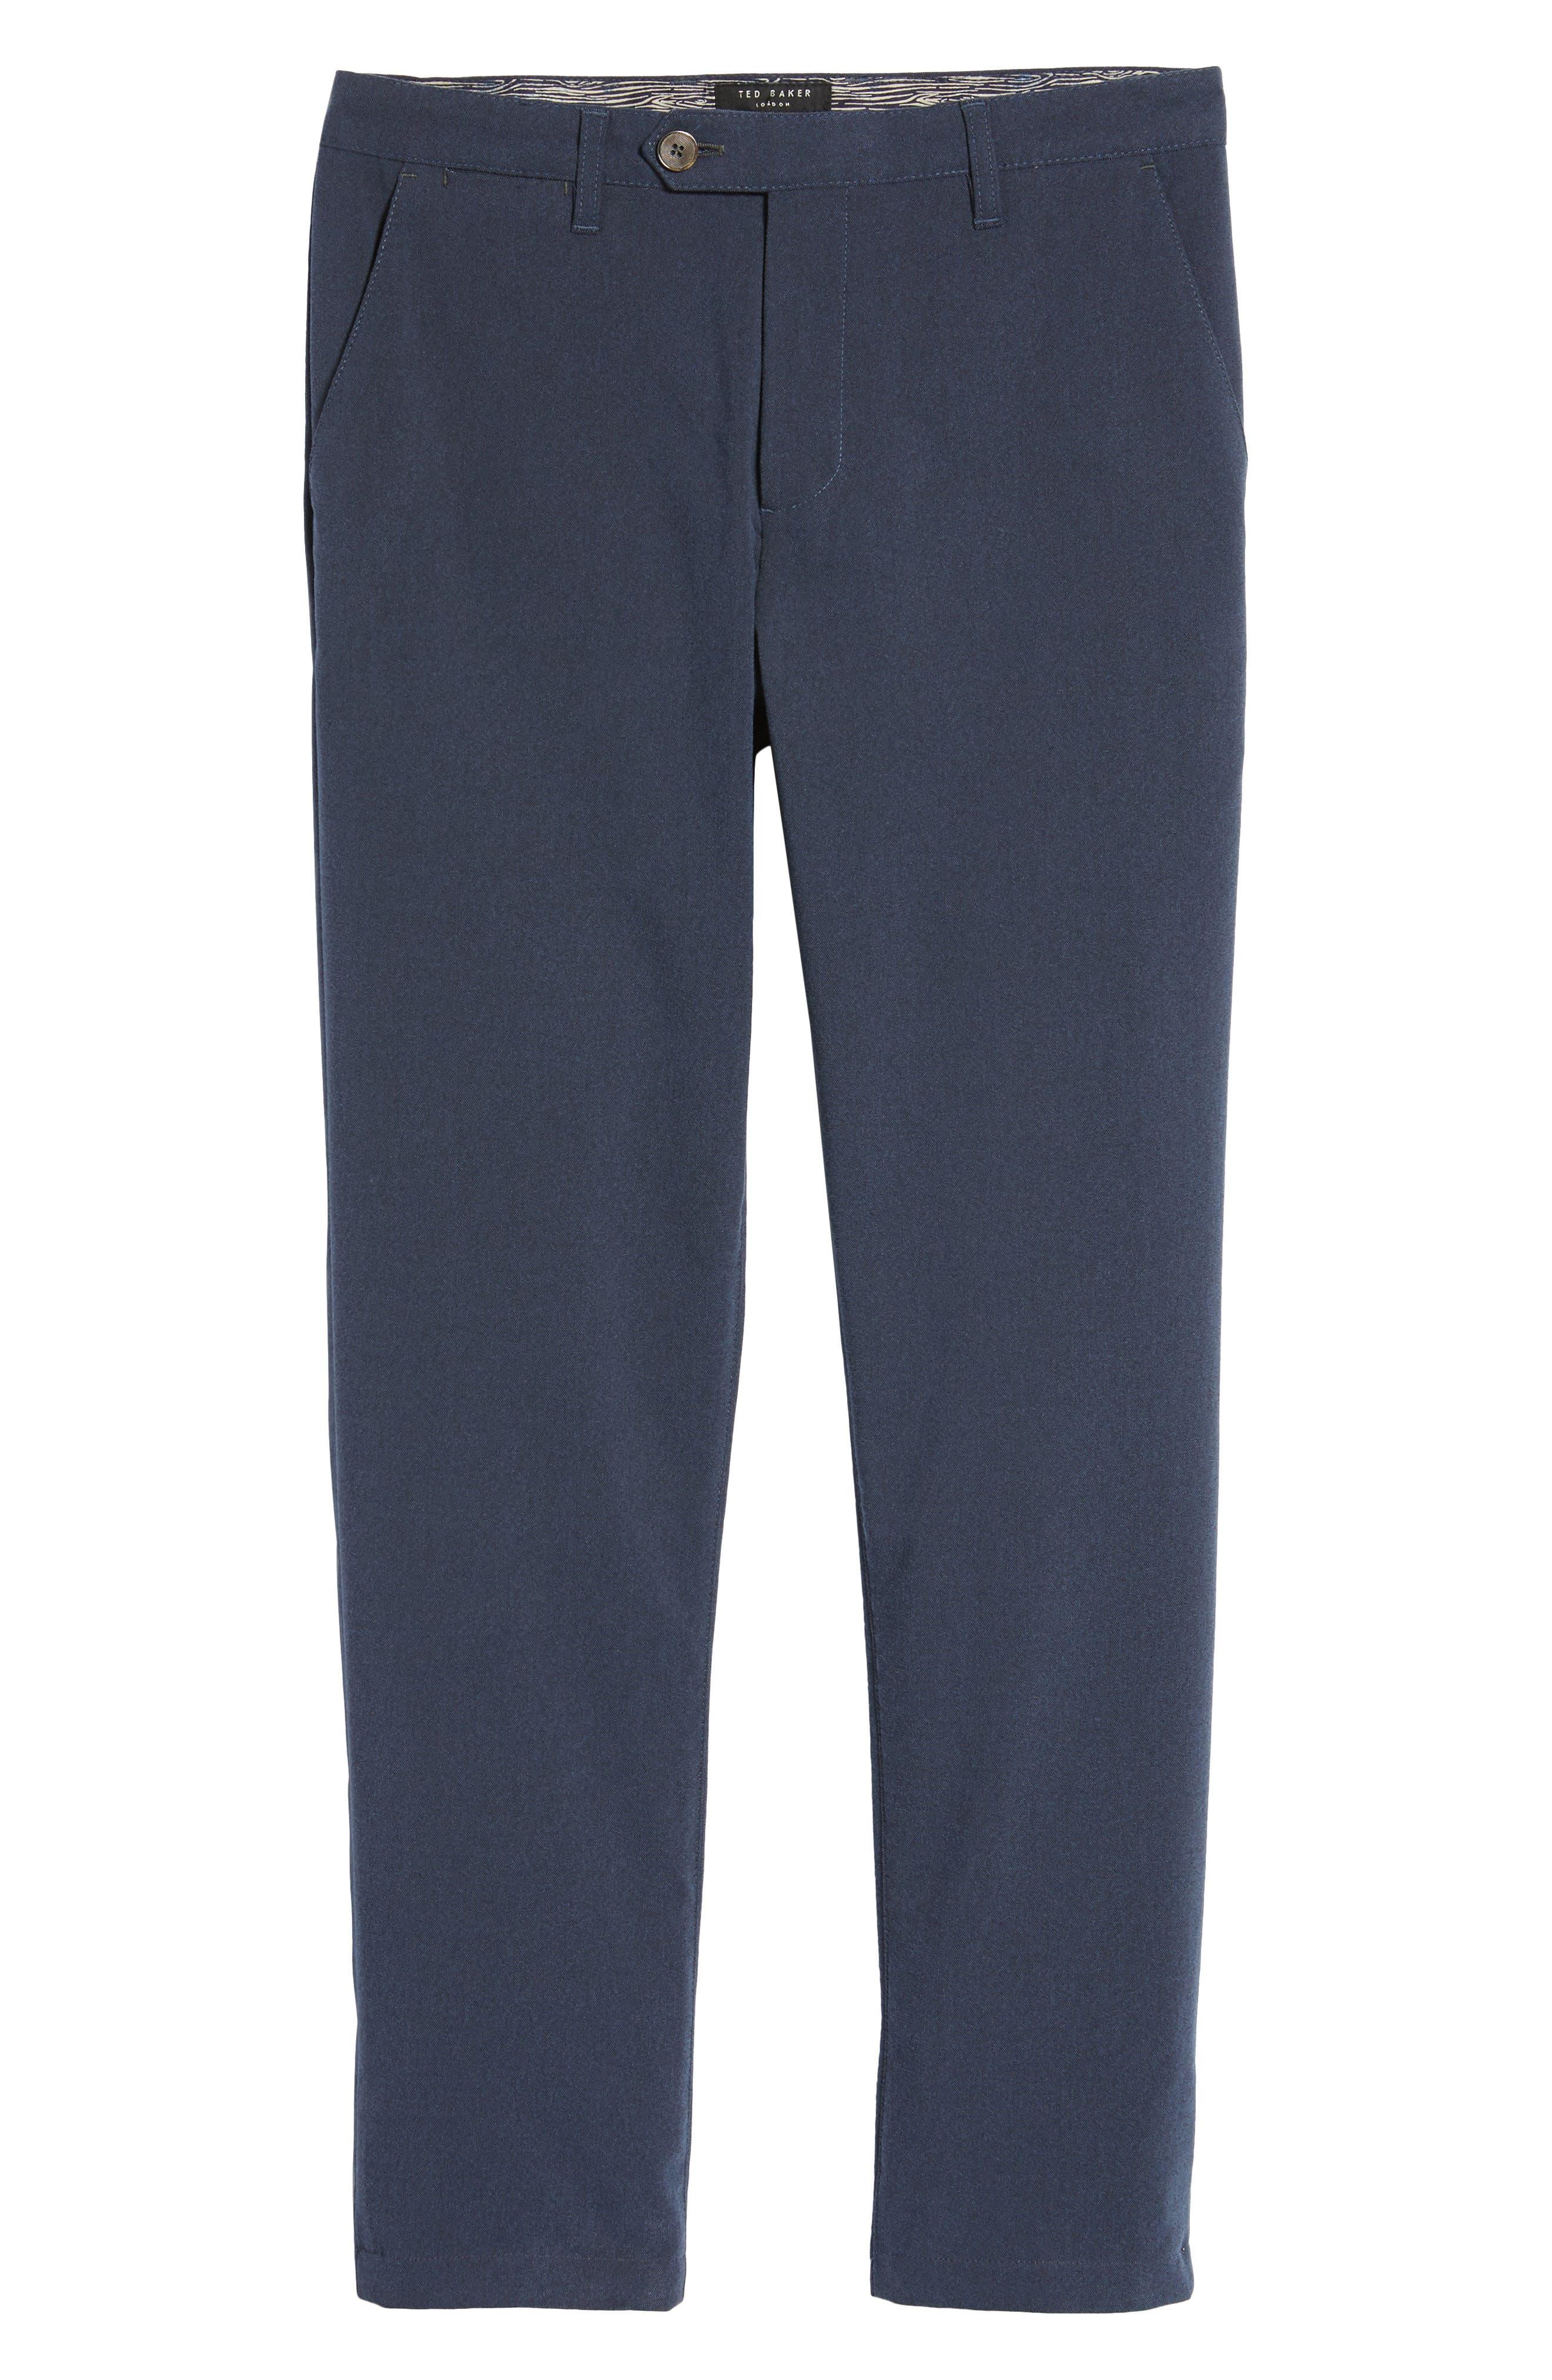 Modern Slim Fit Trousers,                             Alternate thumbnail 18, color,